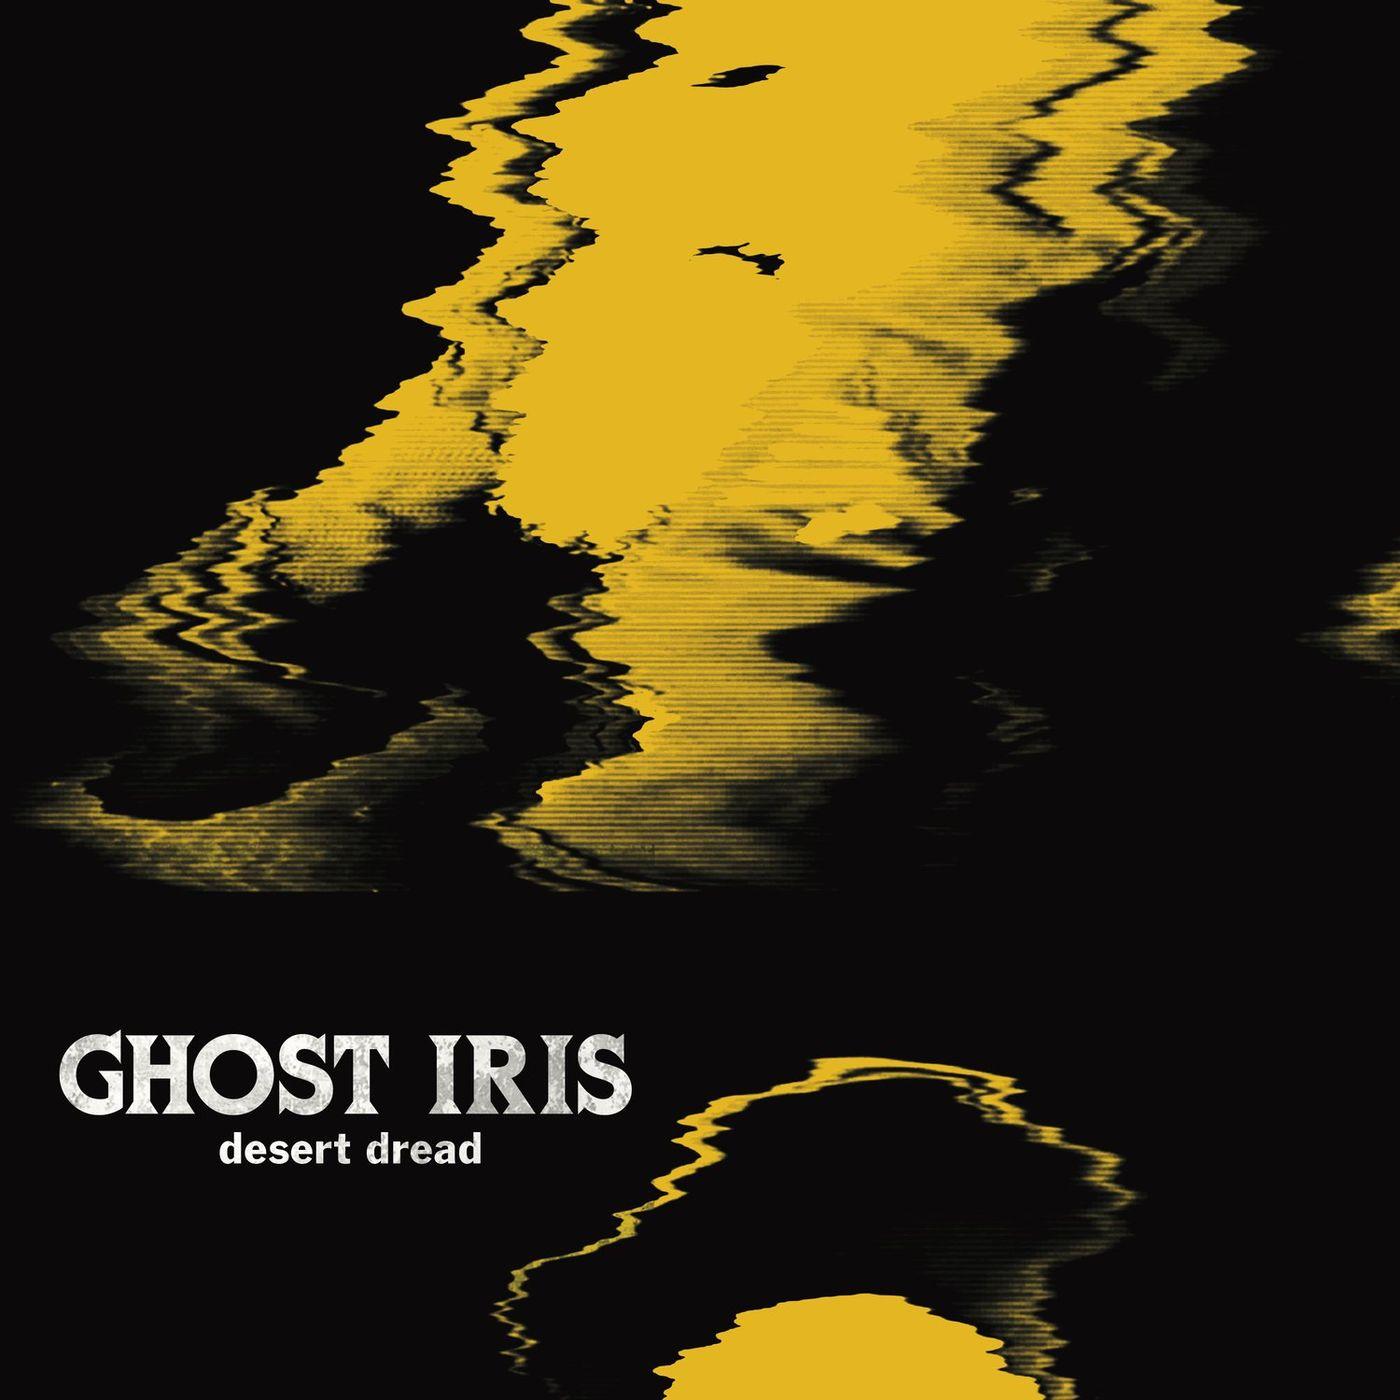 Ghost Iris - Desert Dread [single] (2021)